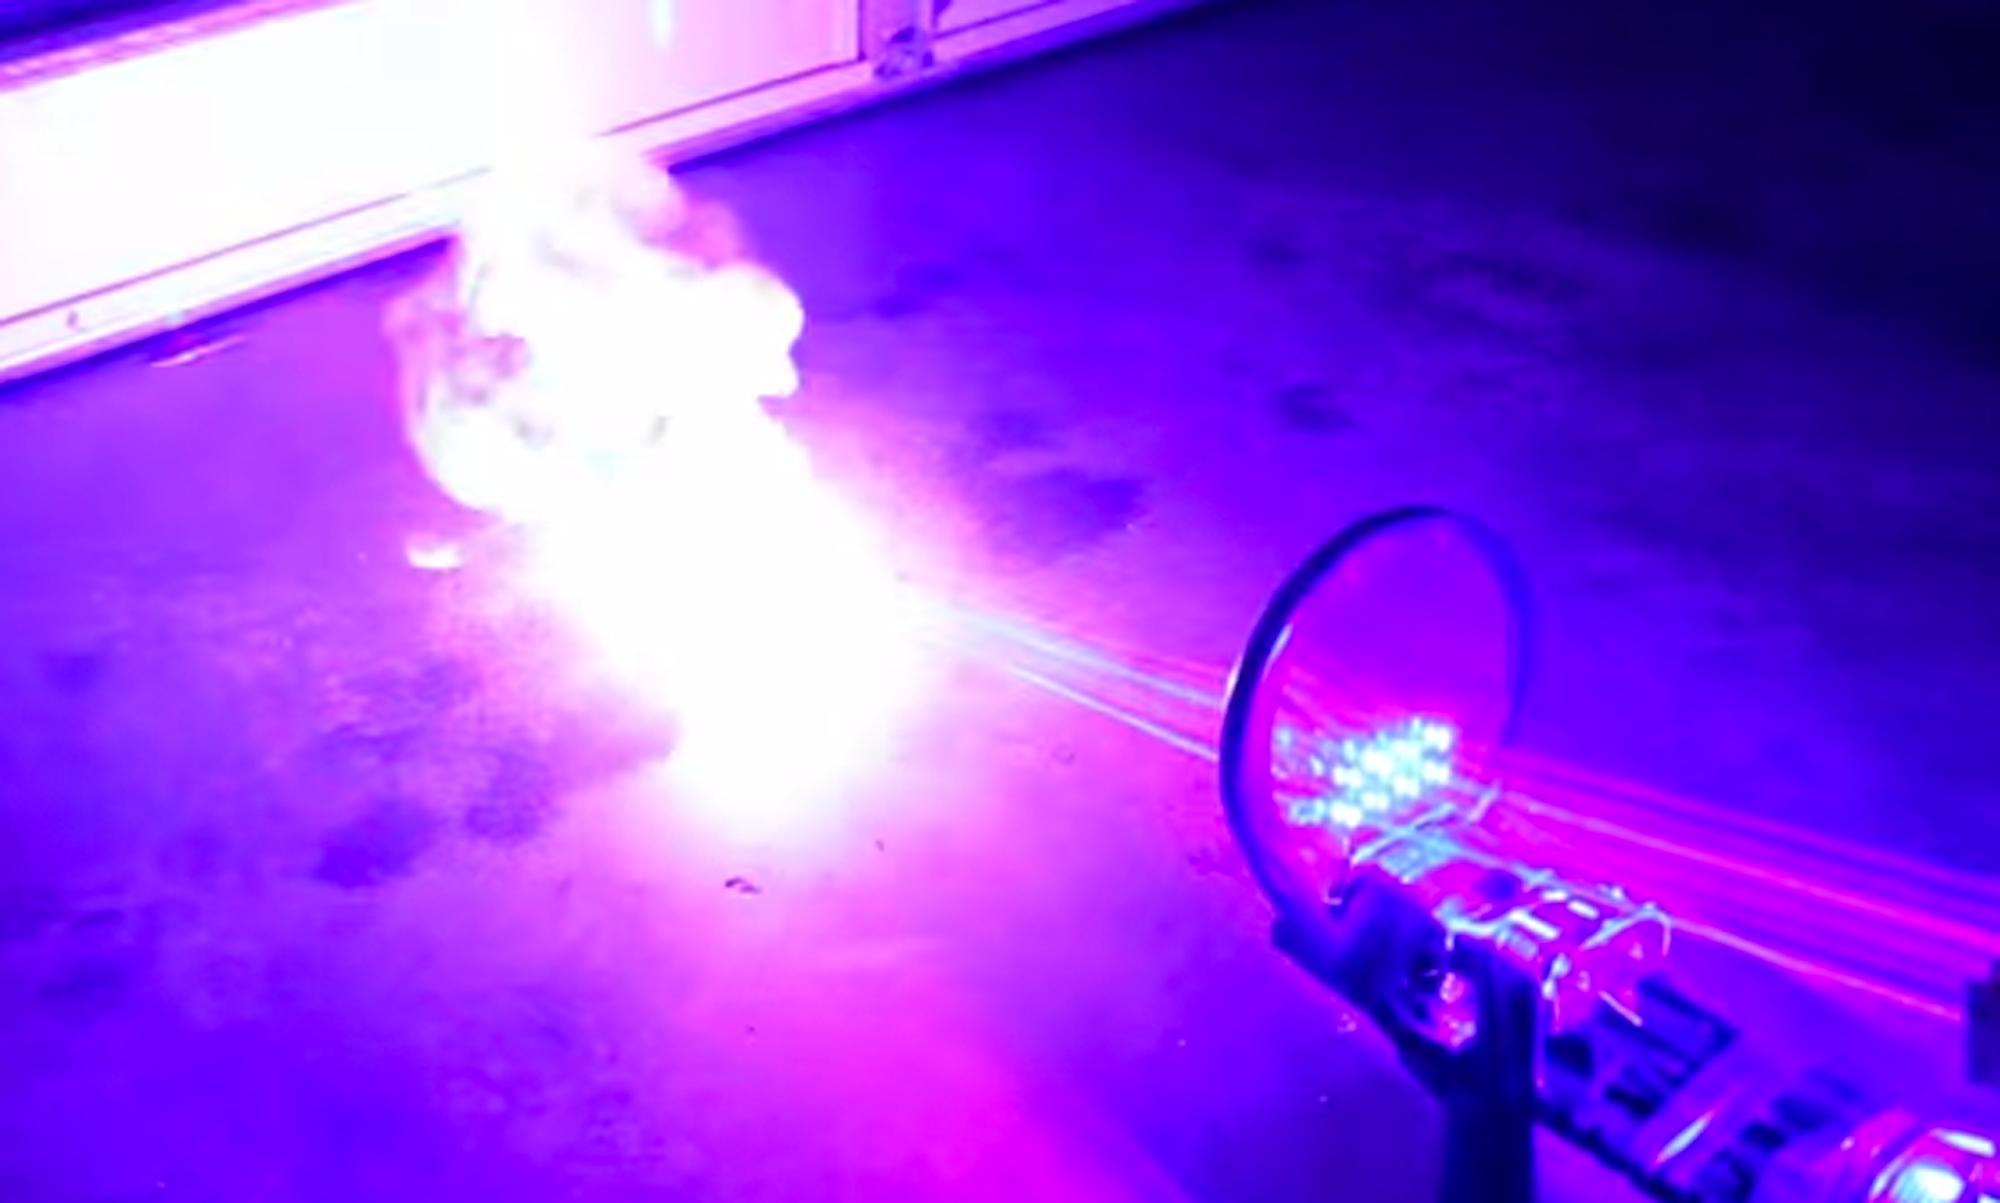 Man Builds Homemade Laser Shotgun